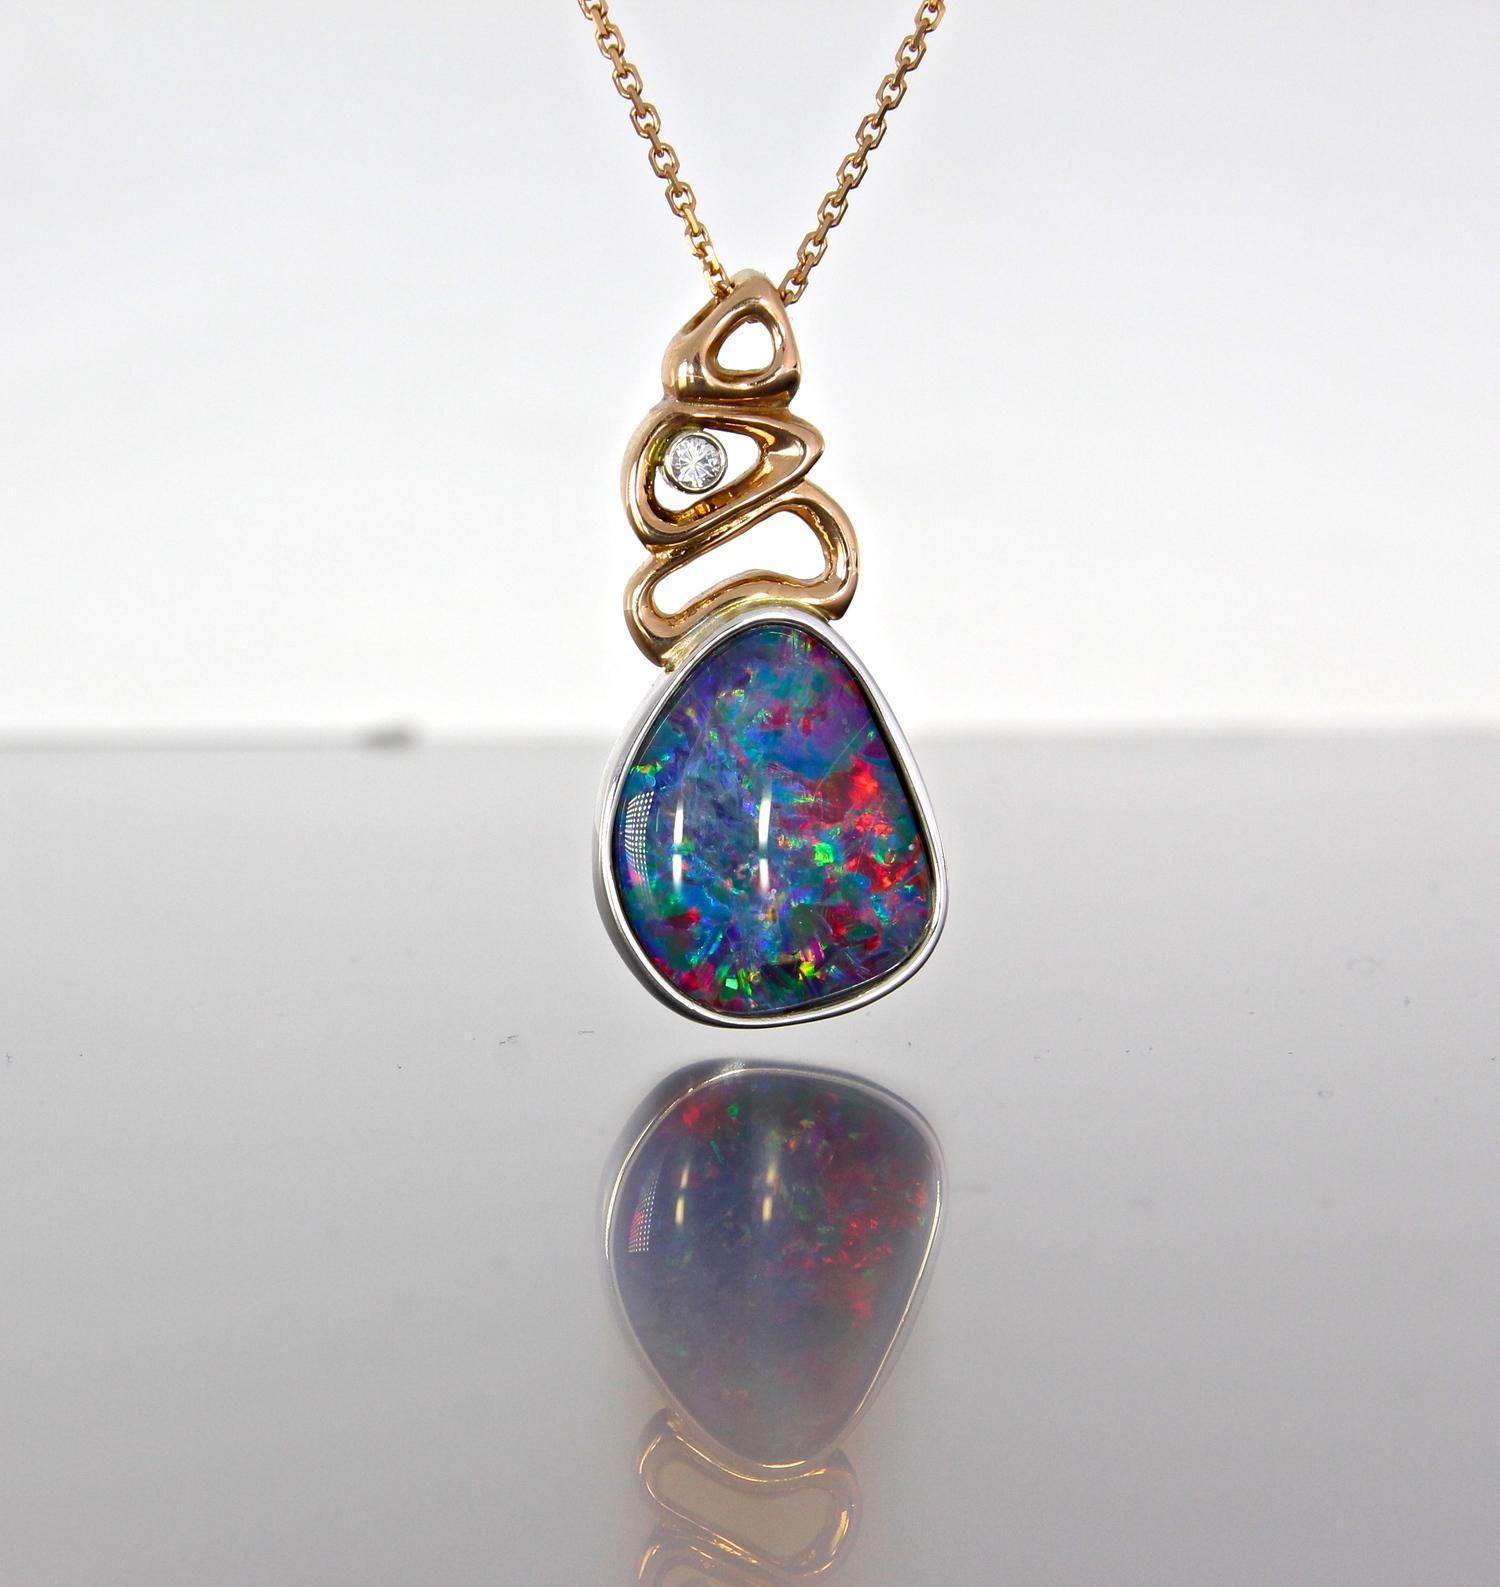 unique-opal-pendant-rose-gold-diamond-accents-fashion-pendant-craft-revival-jewelry-store